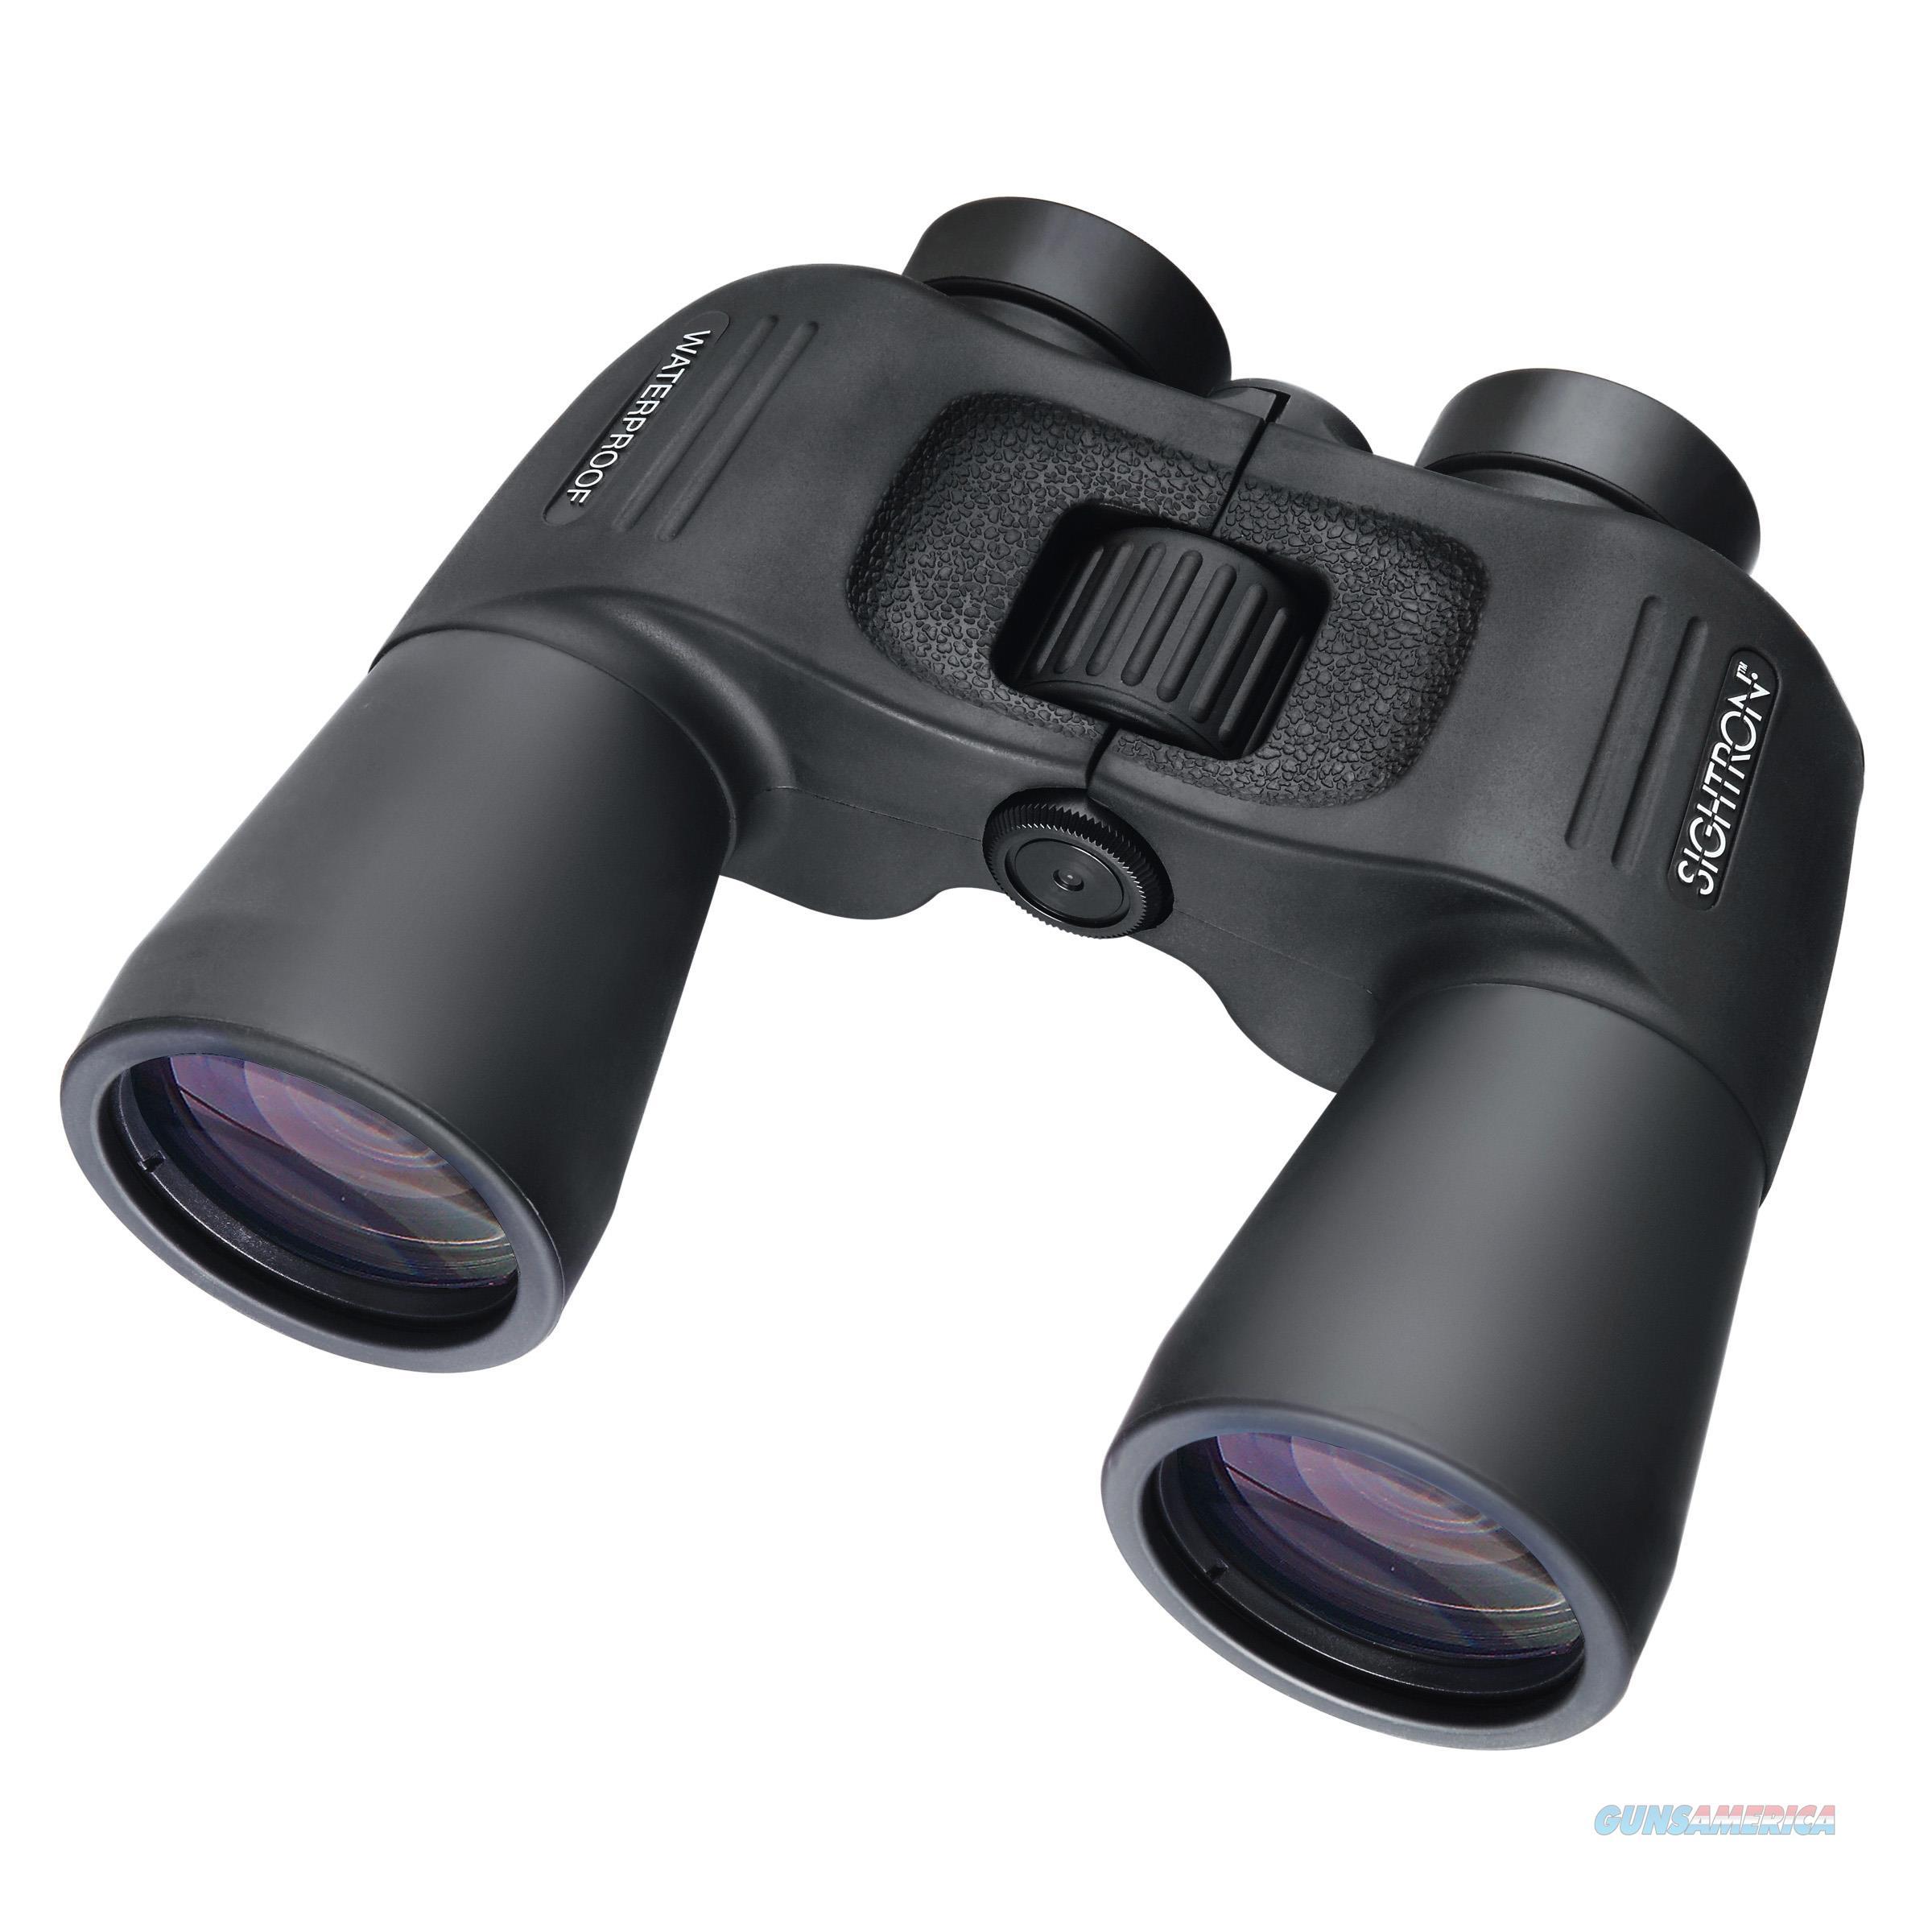 Sightron, Inc. Sii Wp Series Binocular 30024  Non-Guns > Scopes/Mounts/Rings & Optics > Non-Scope Optics > Binoculars